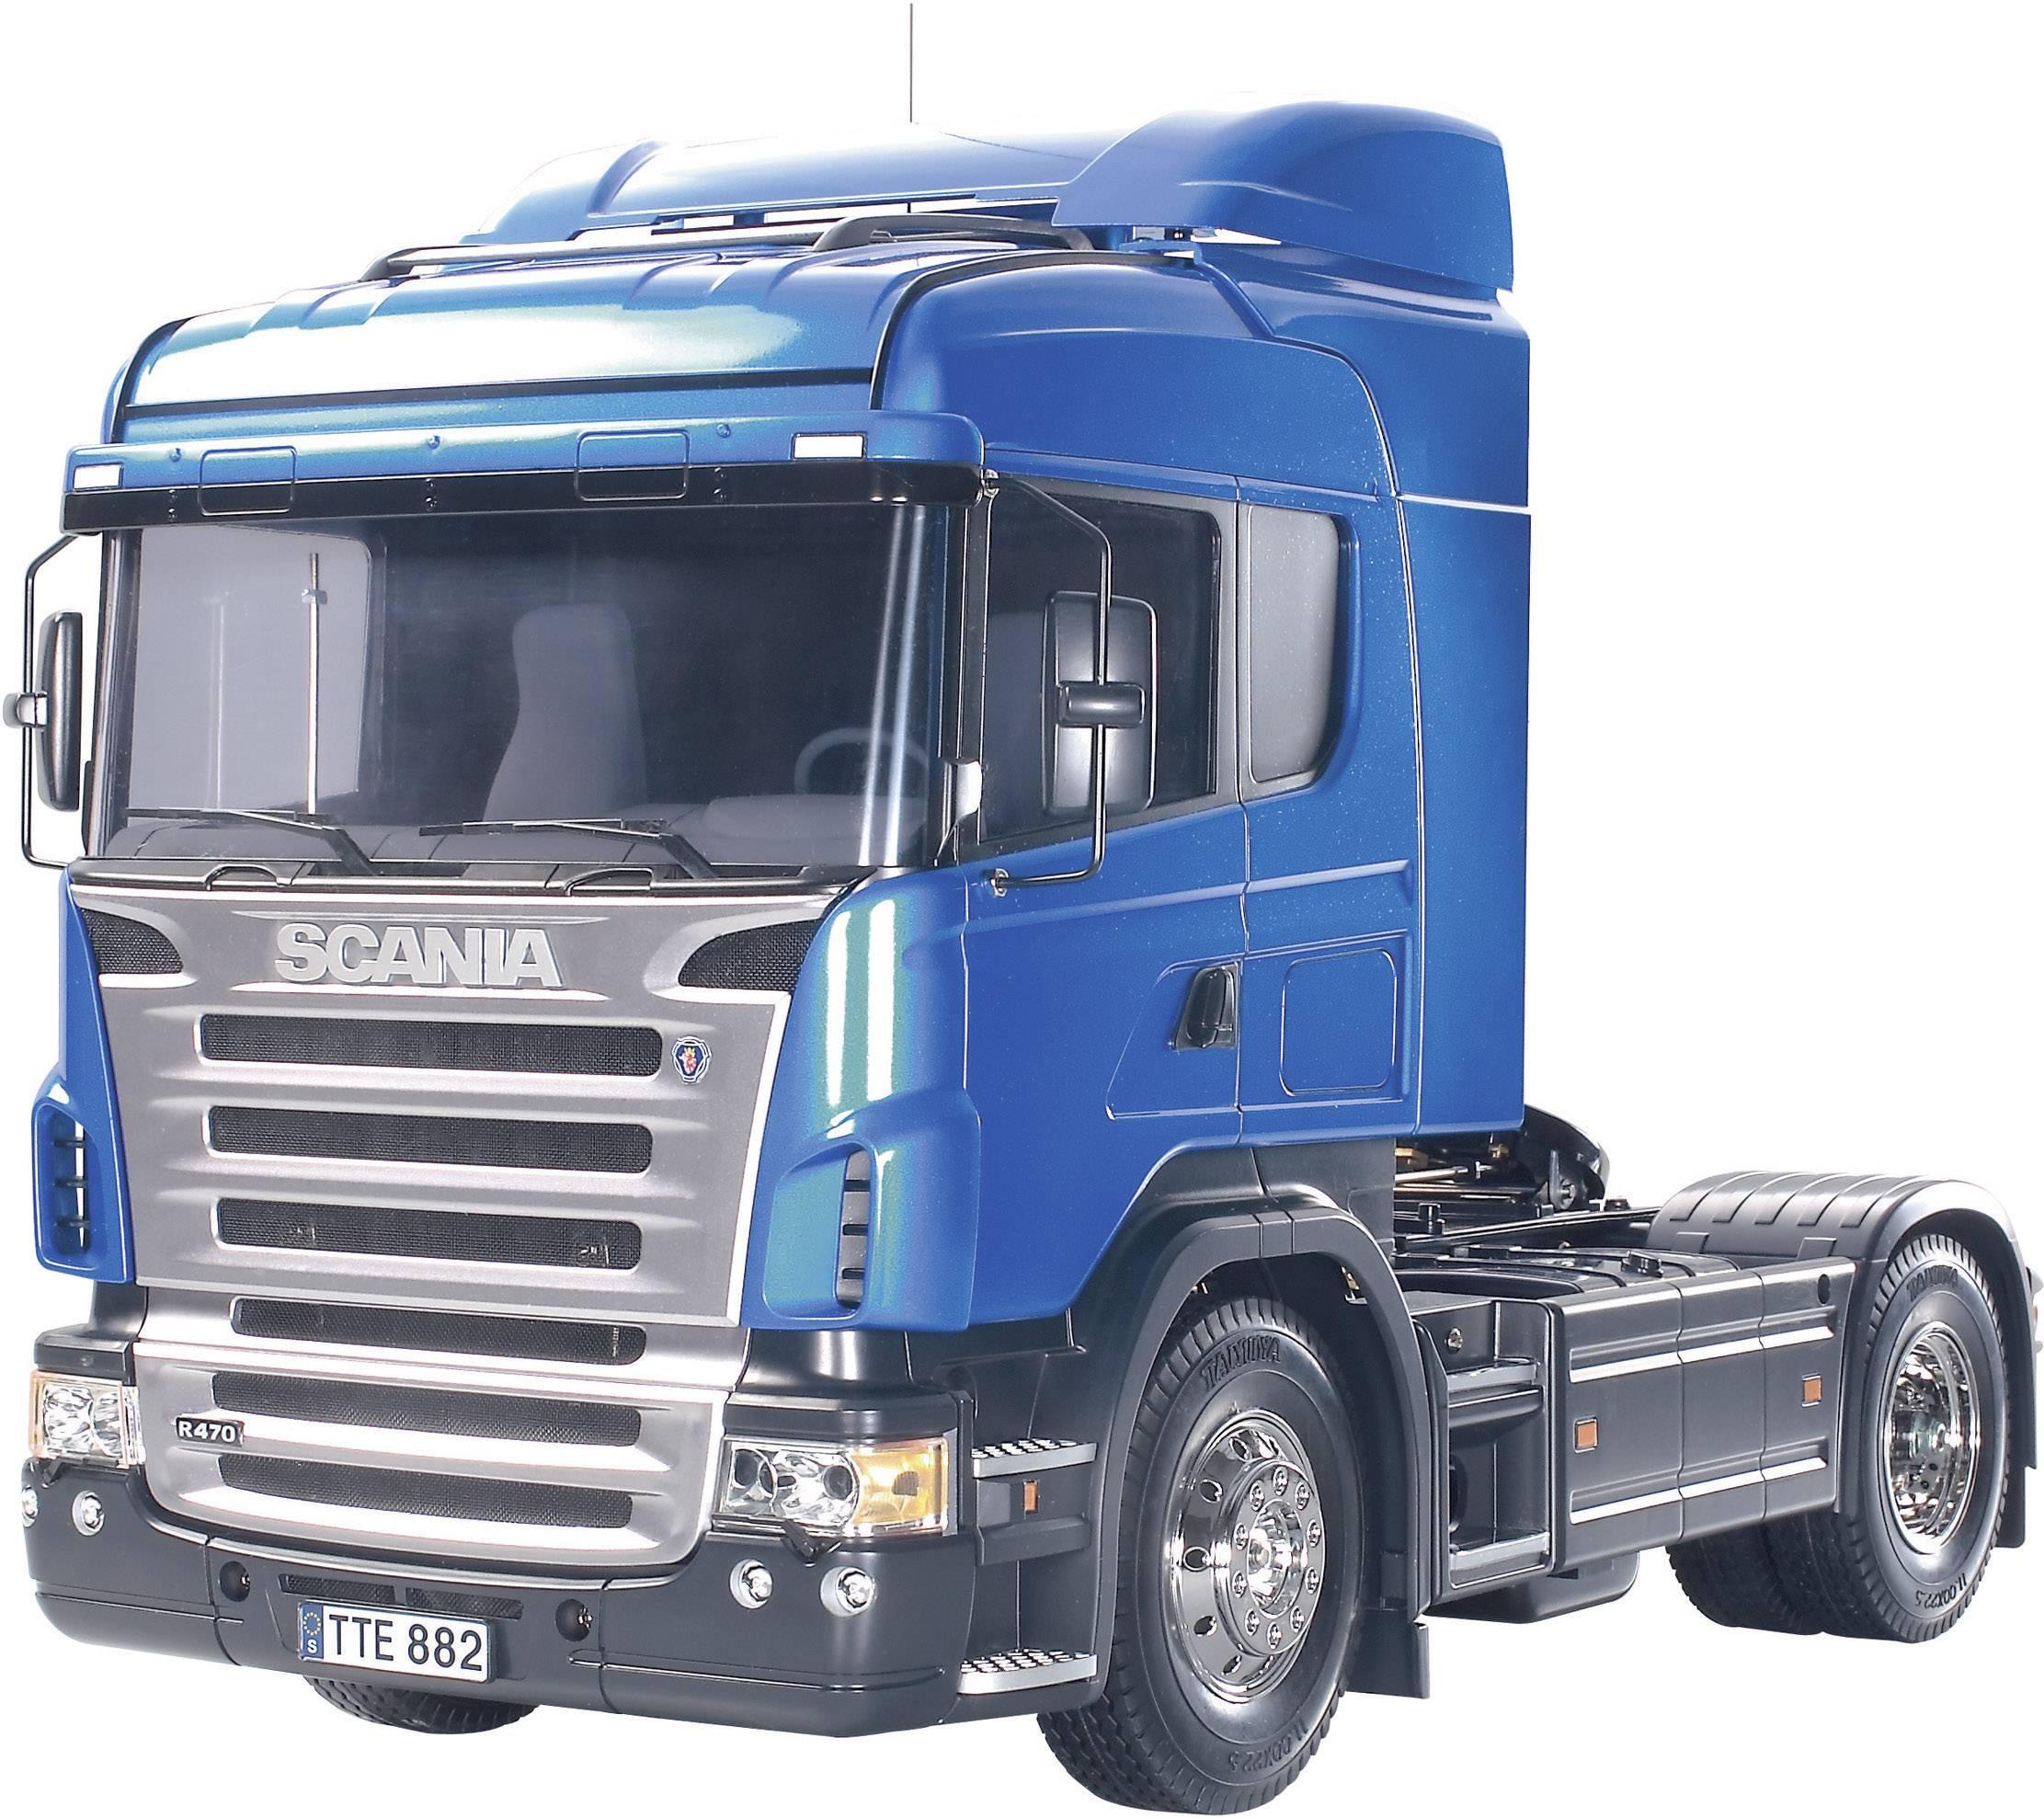 Scania R470 Tamiya 300056318, 1:14 ,BS